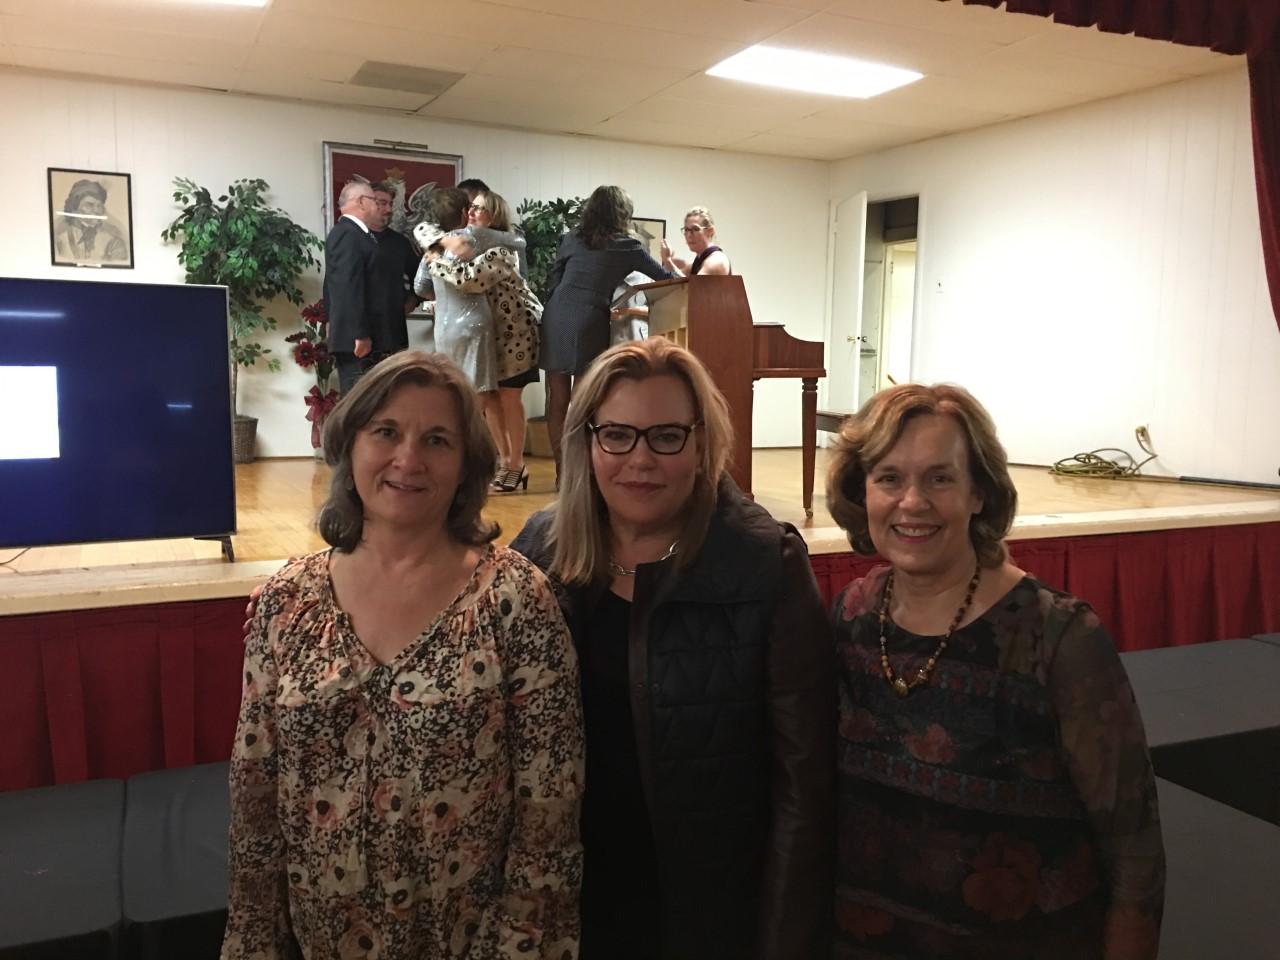 Cyndi Signorelli, Celeste, Lorraine Gudas